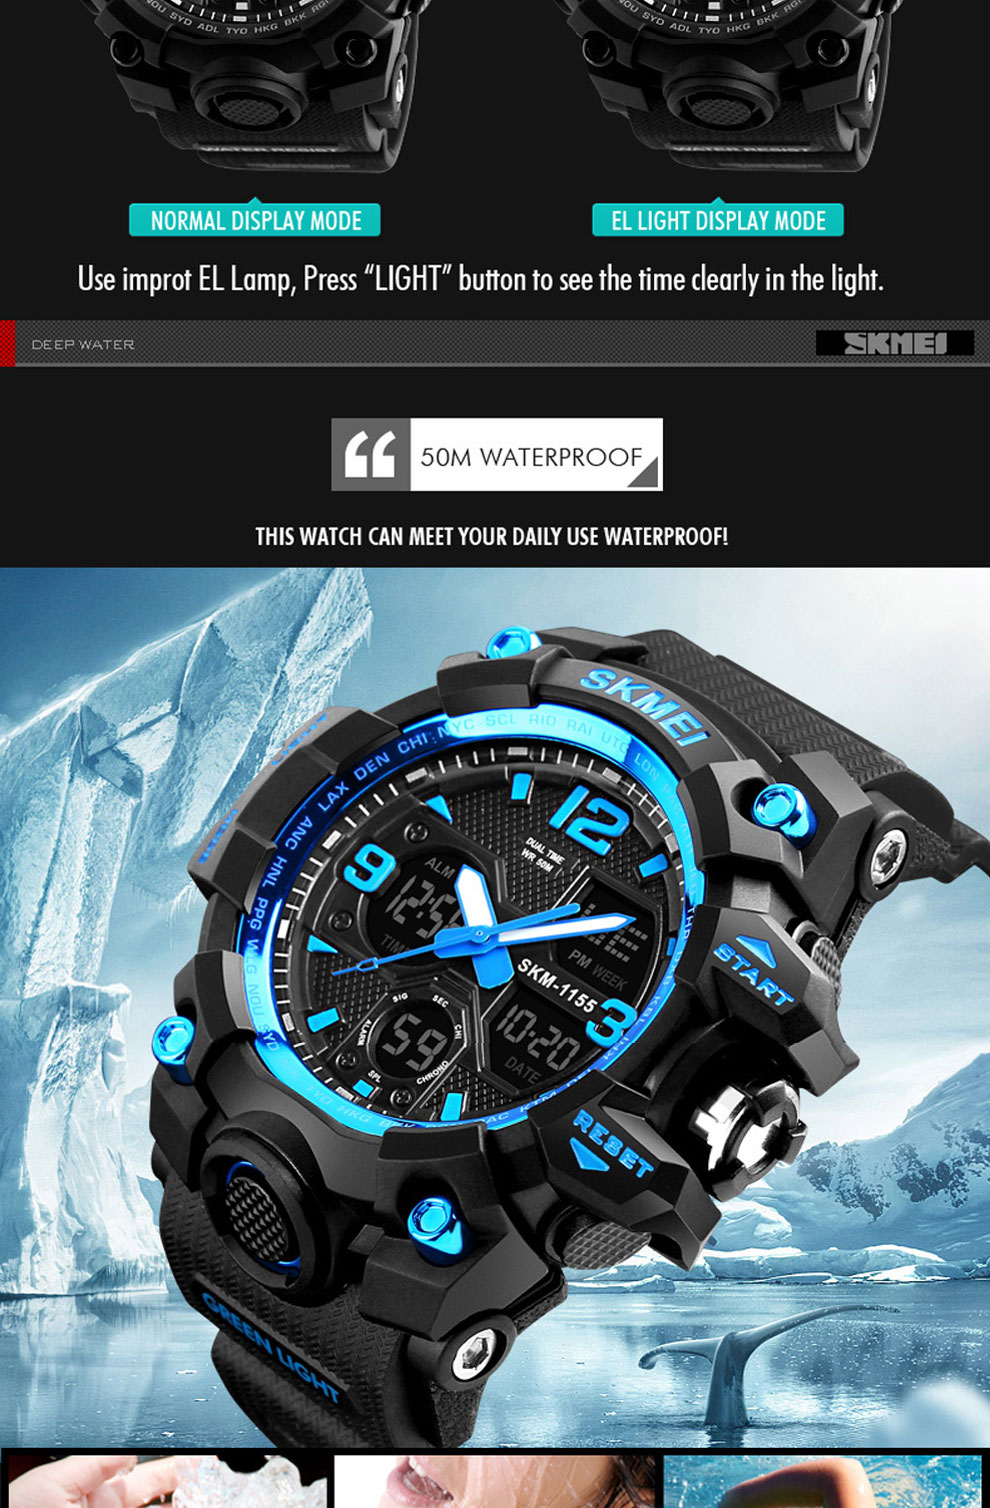 HTB10P0uRwHqK1RjSZFEq6AGMXXaN SKMEI Brand Luxury Military Sports Watches Men Quartz Analog LED Digital Clock Man Waterproof Dual Display Wristwatches Relogio